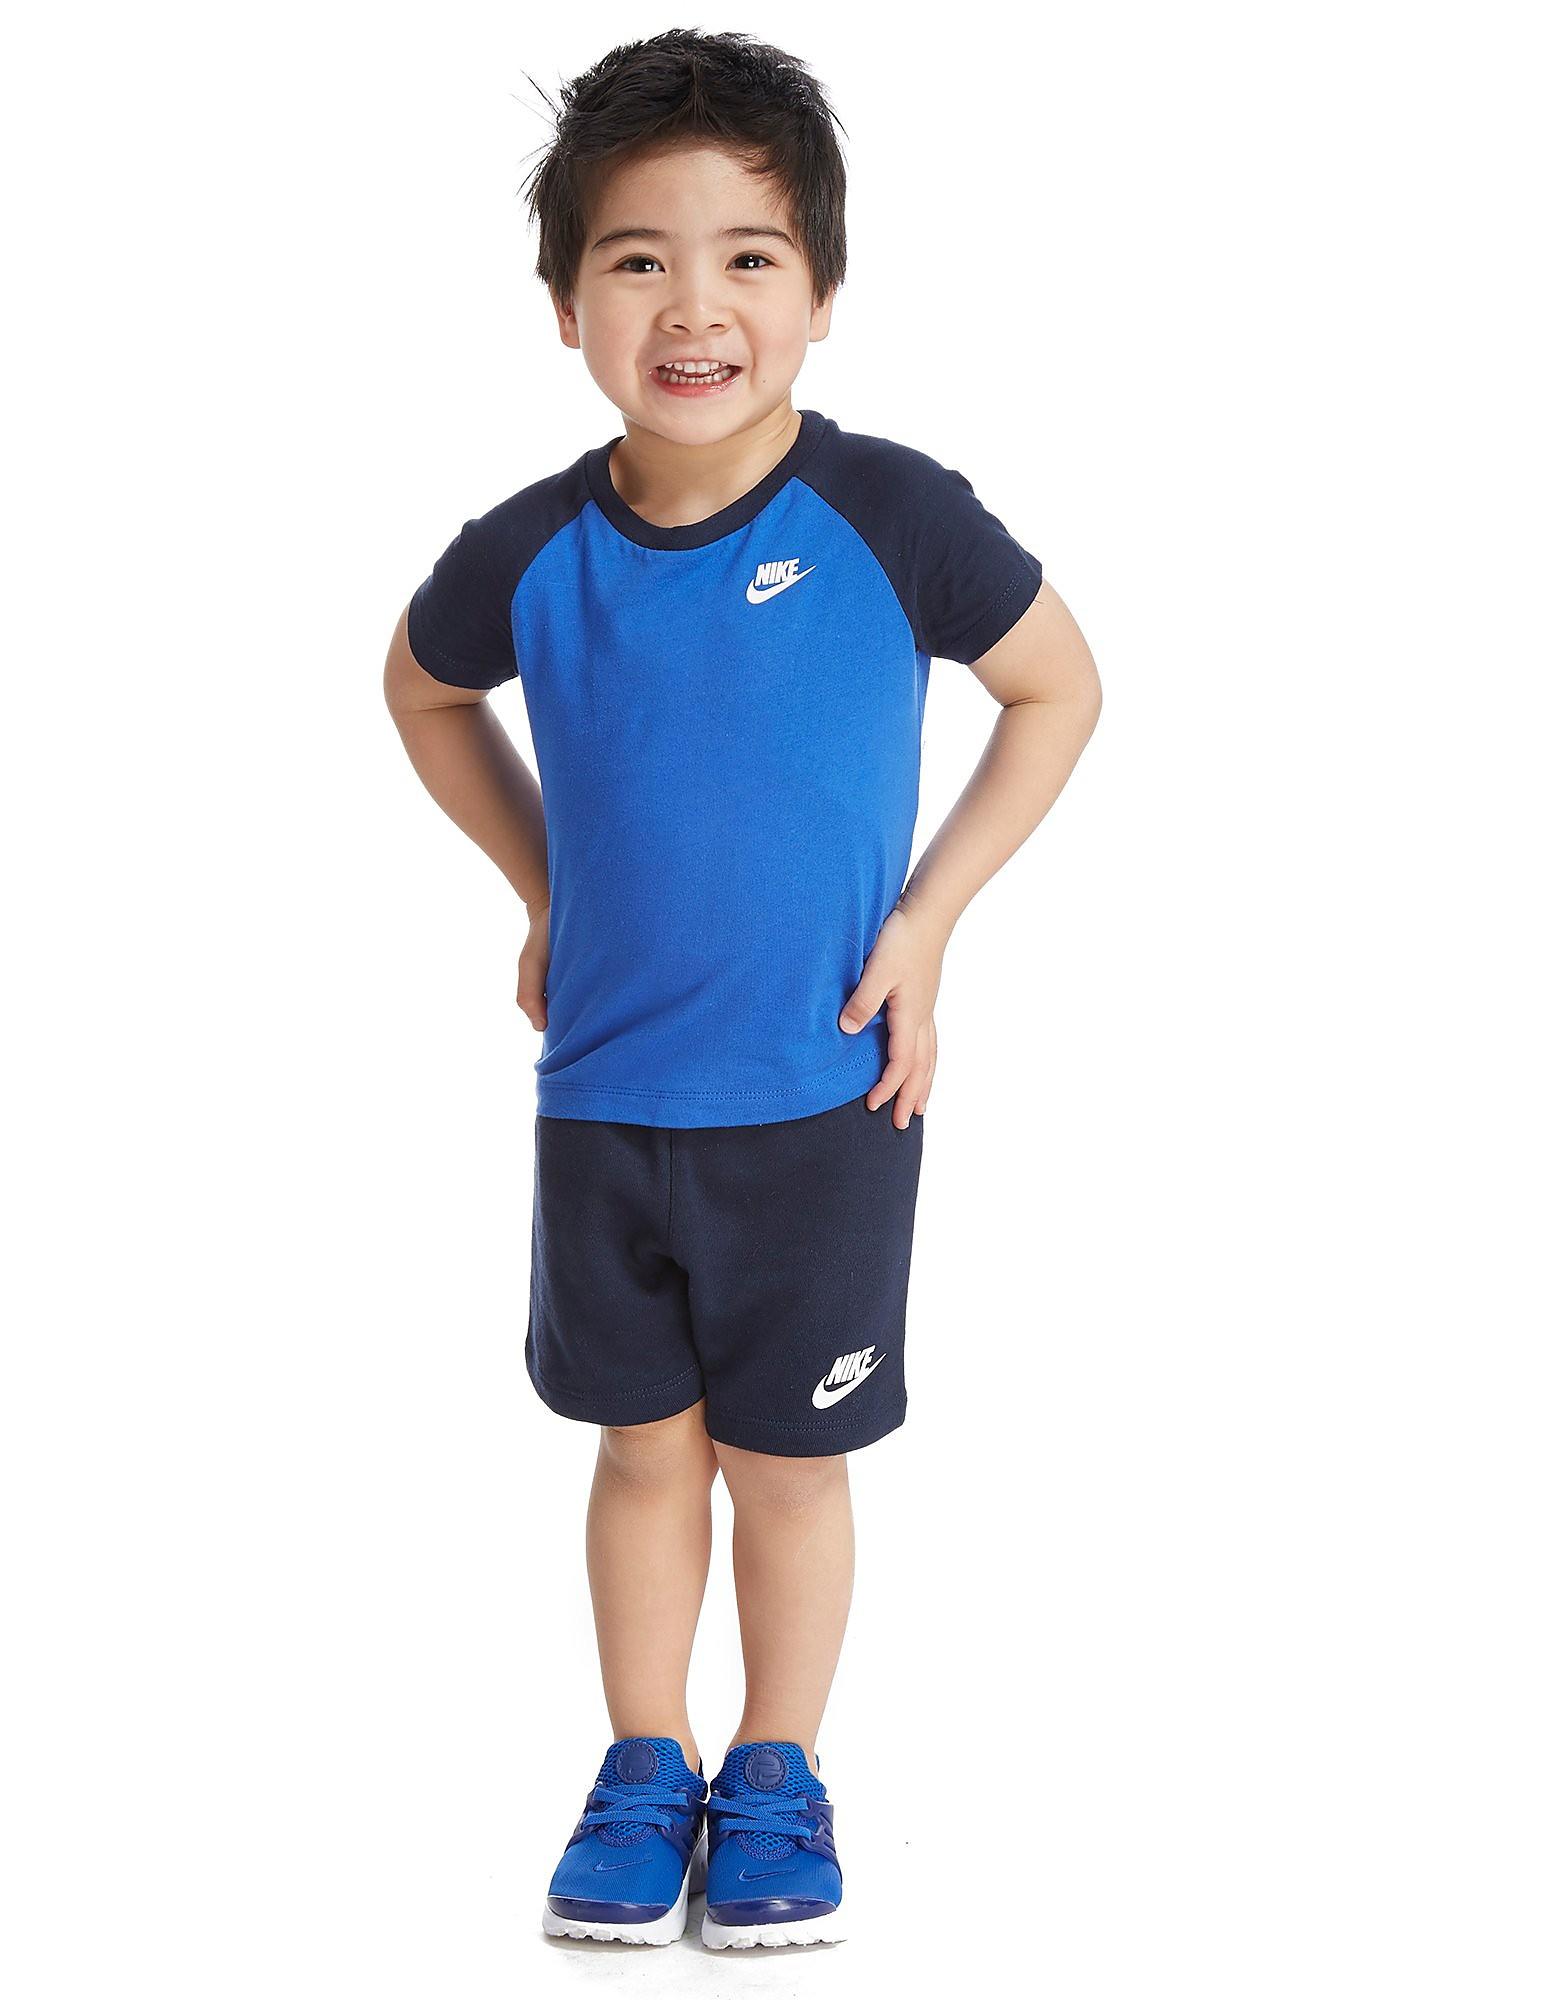 Nike T-Shirt/Shorts Set Baby's - Blauw - Kind